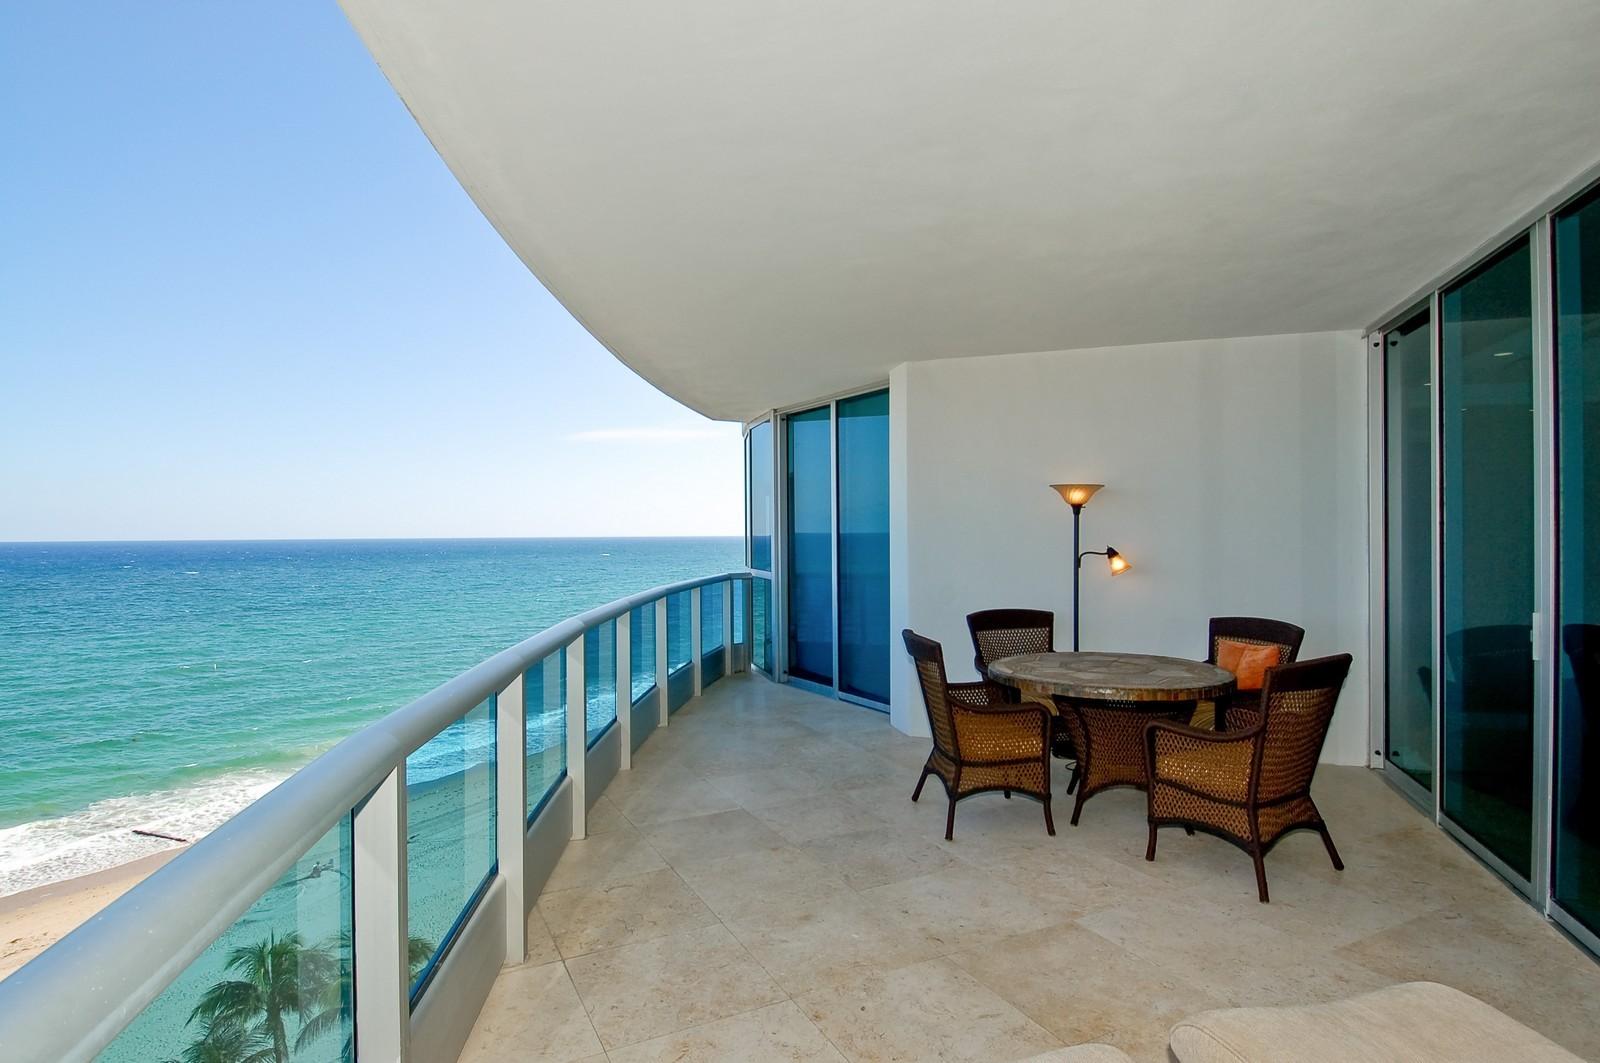 Real Estate Photography - 1600 S Ocean Blvd, Apt 802, Pompano Beach, FL, 33062 - Balcony